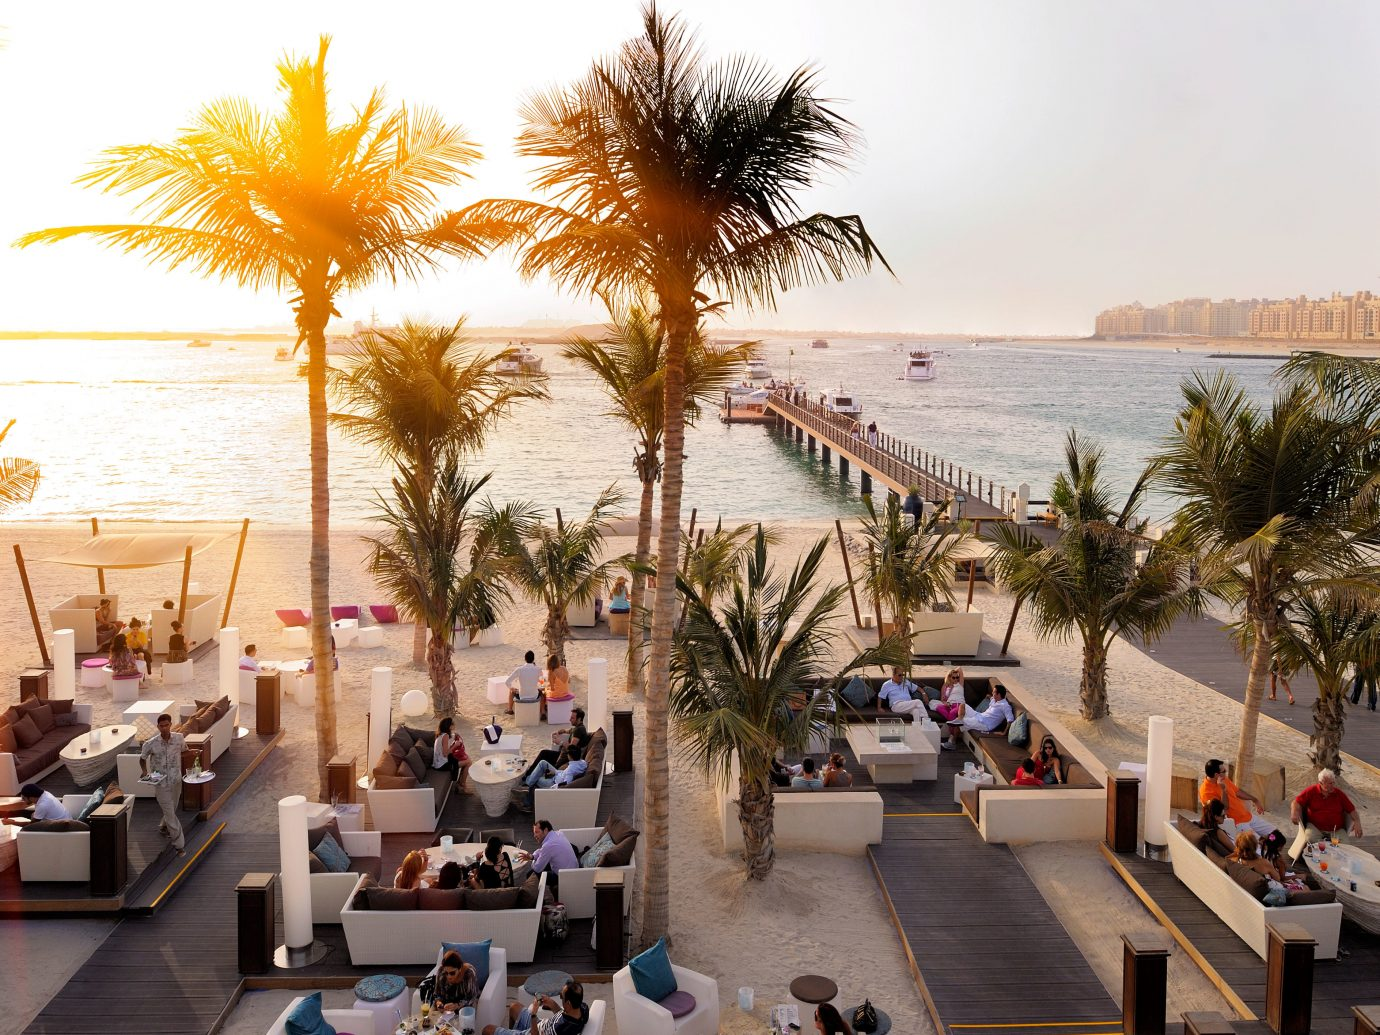 Beach Beachfront Drink Dubai Eat Elegant Hotels Lounge Luxury Luxury Travel Middle East Modern Resort Waterfront sky tree outdoor leisure vacation estate arecales palm plaza plant furniture